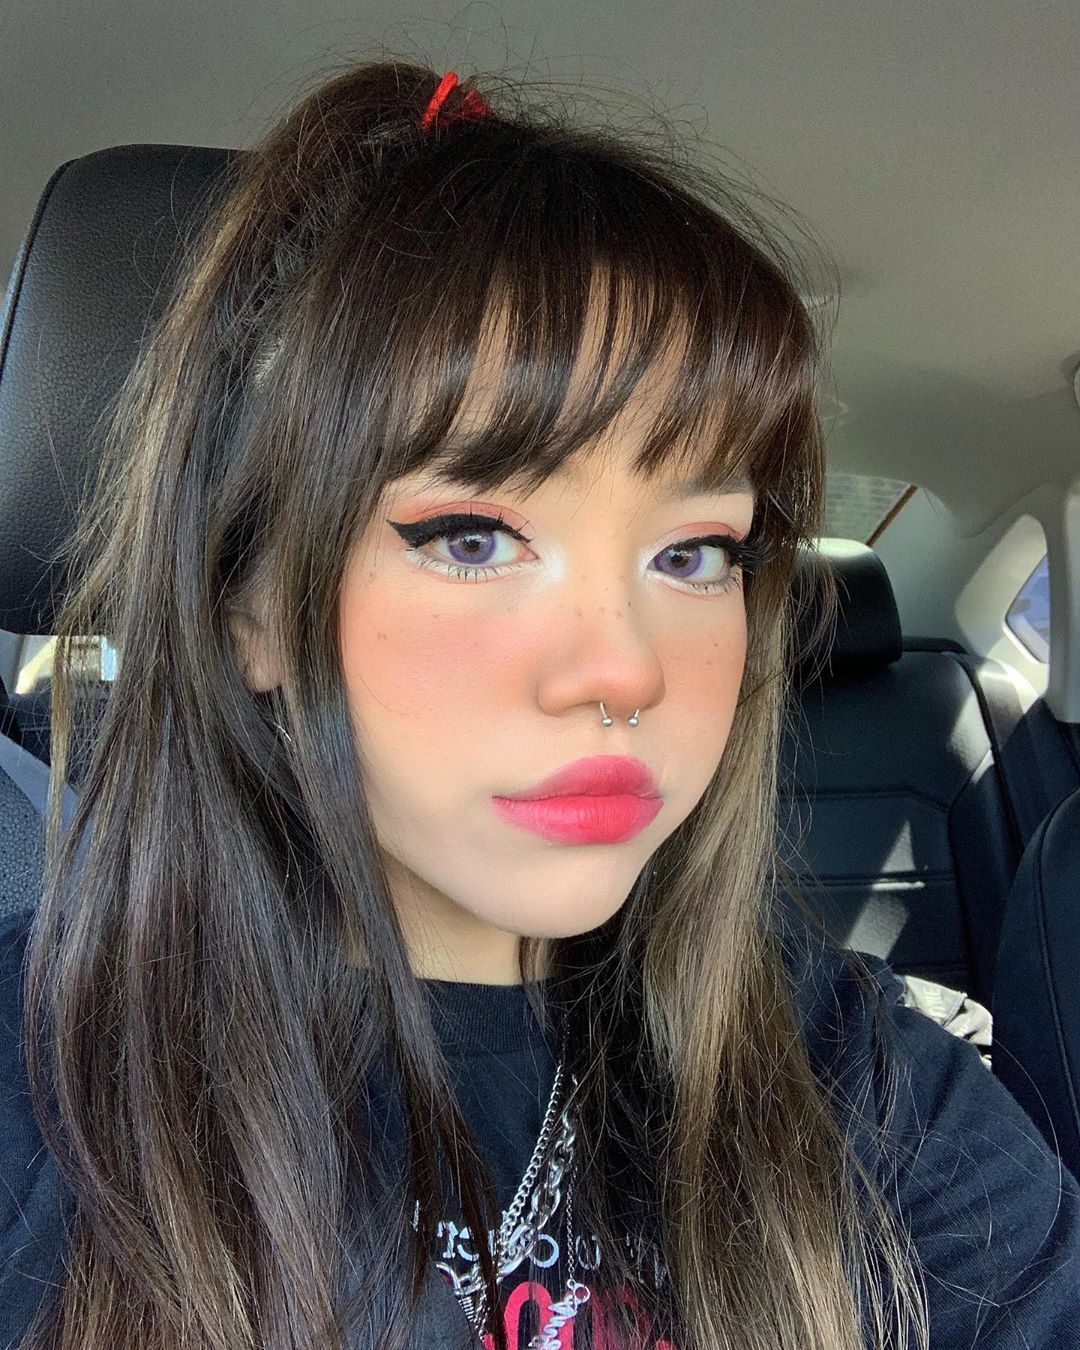 Instagram Cyberstephanie In 2020 No Eyeliner Makeup Hair Beauty Beauty